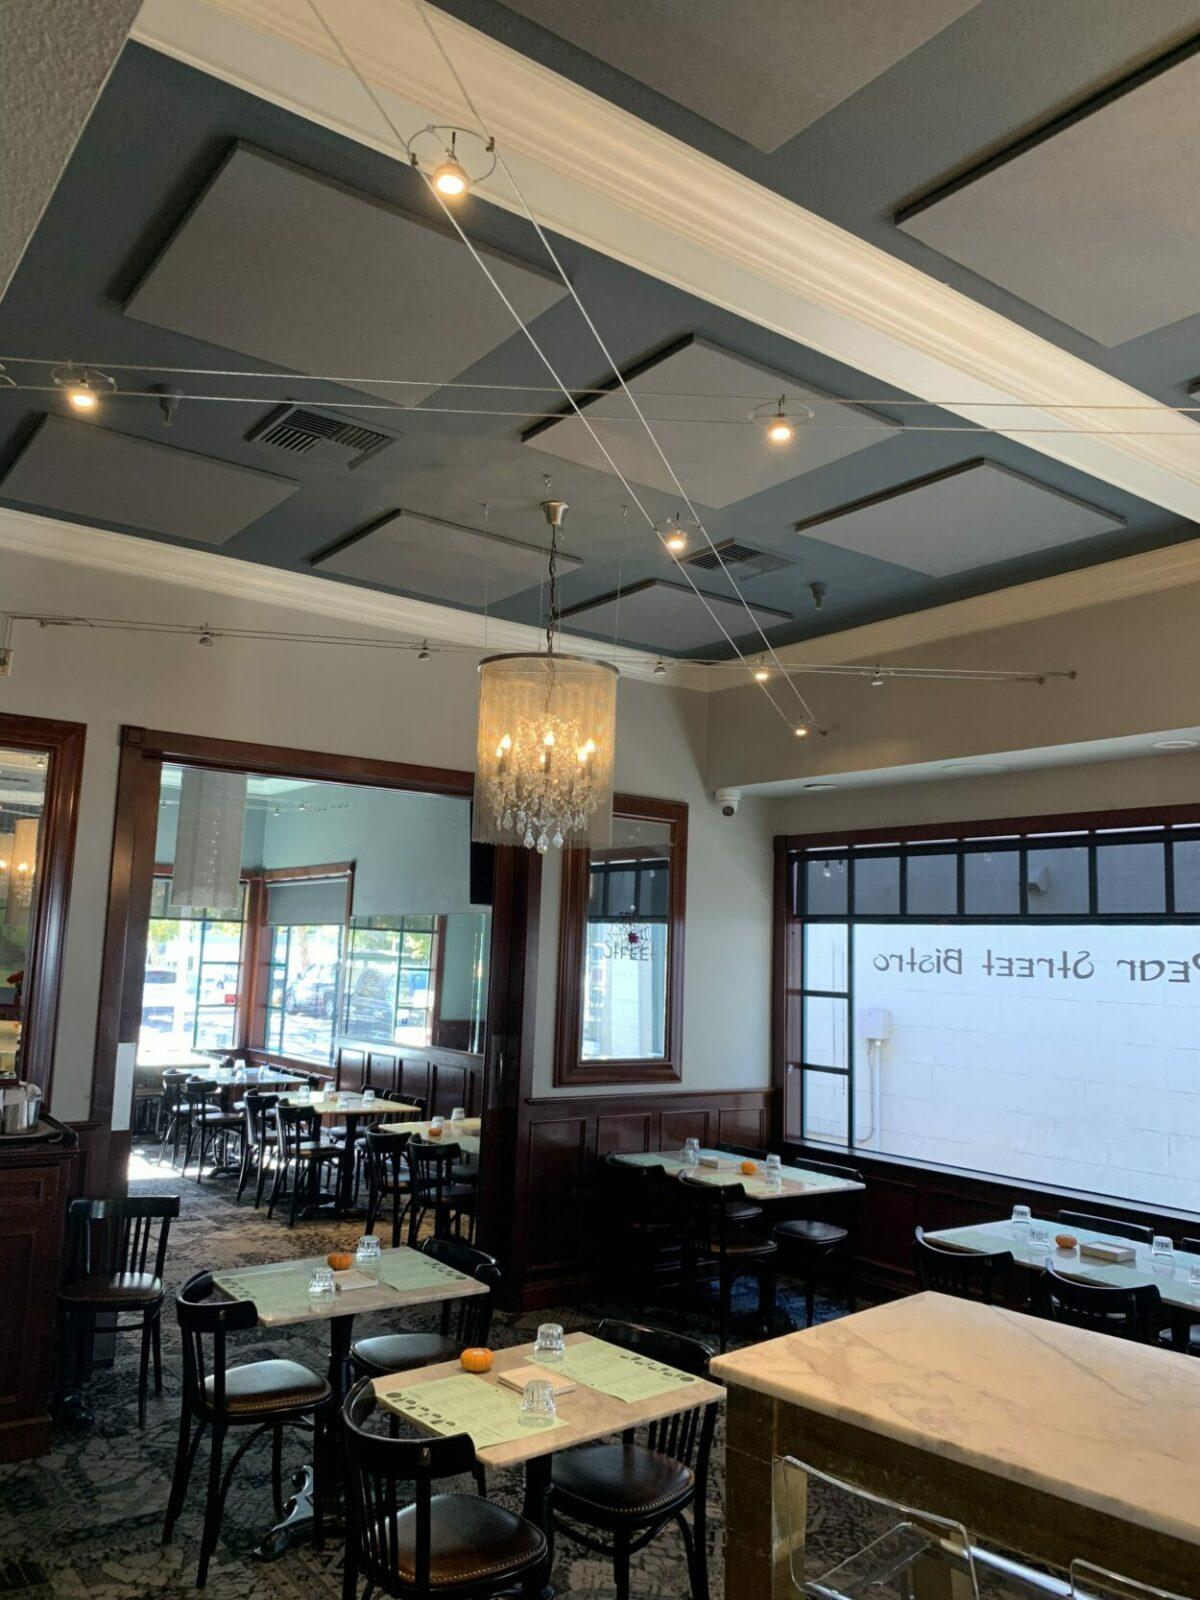 sound panels on ceiling control restaurant noise